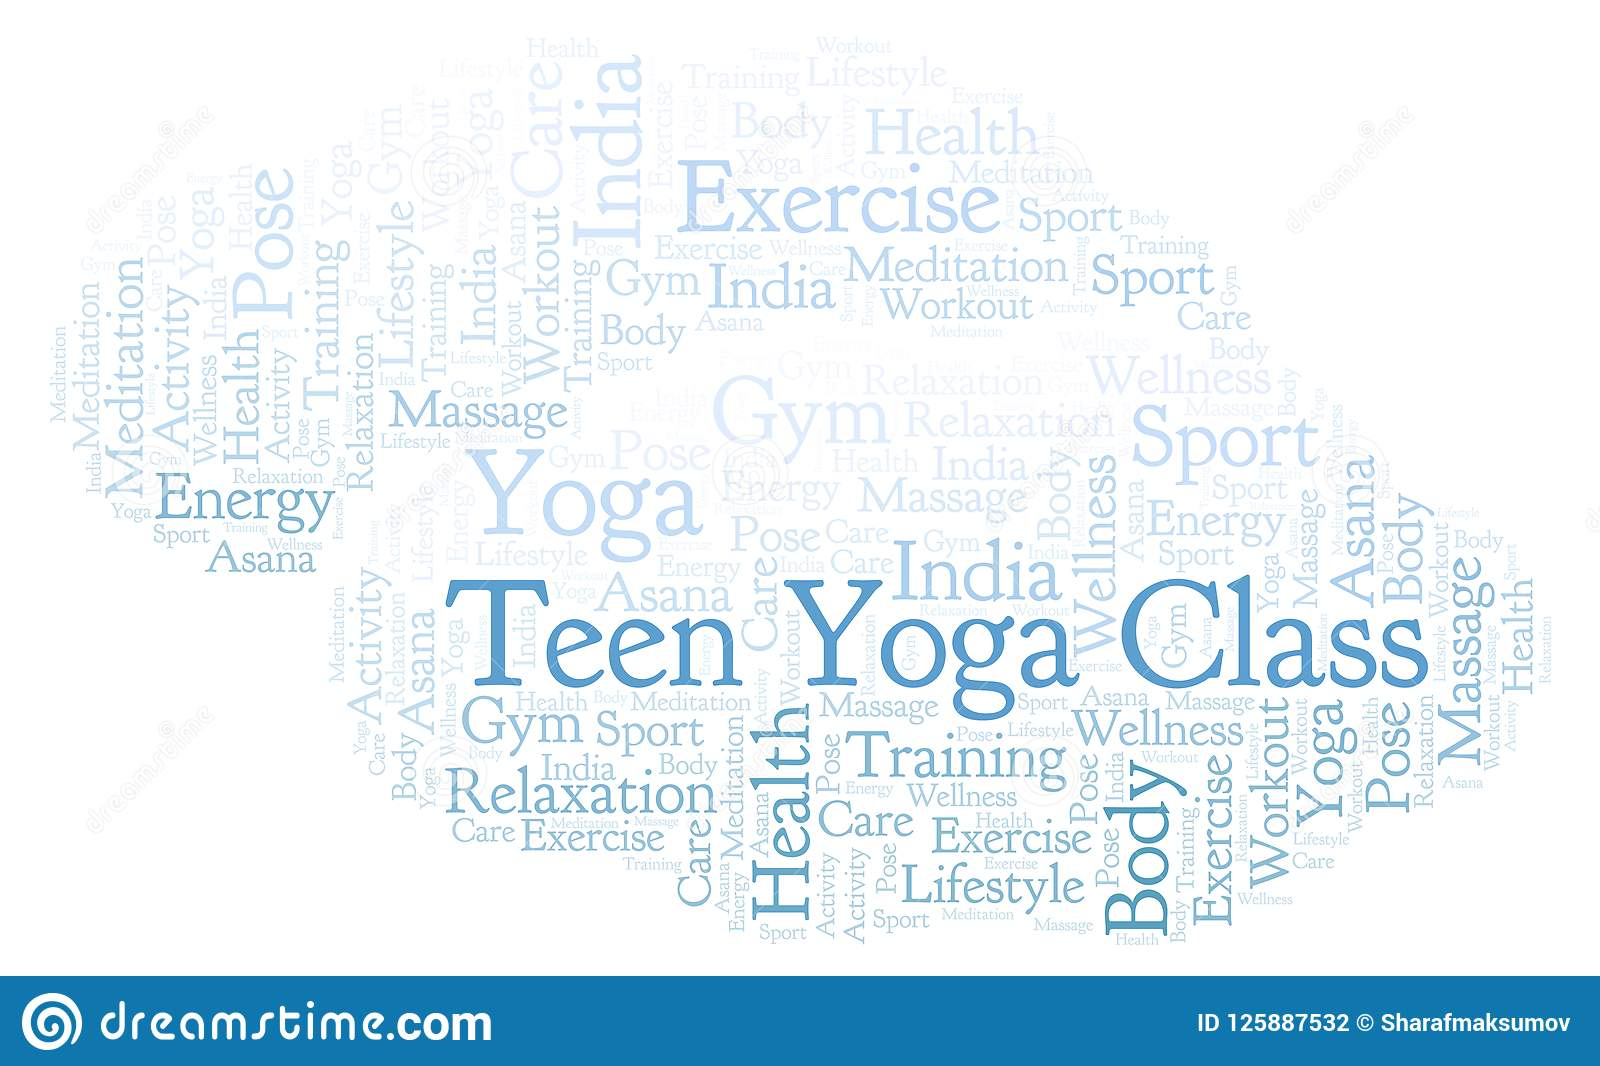 Teen yoga class word cloud stock illustration illustration of download teen yoga class word cloud stock illustration illustration of illustration greeting m4hsunfo